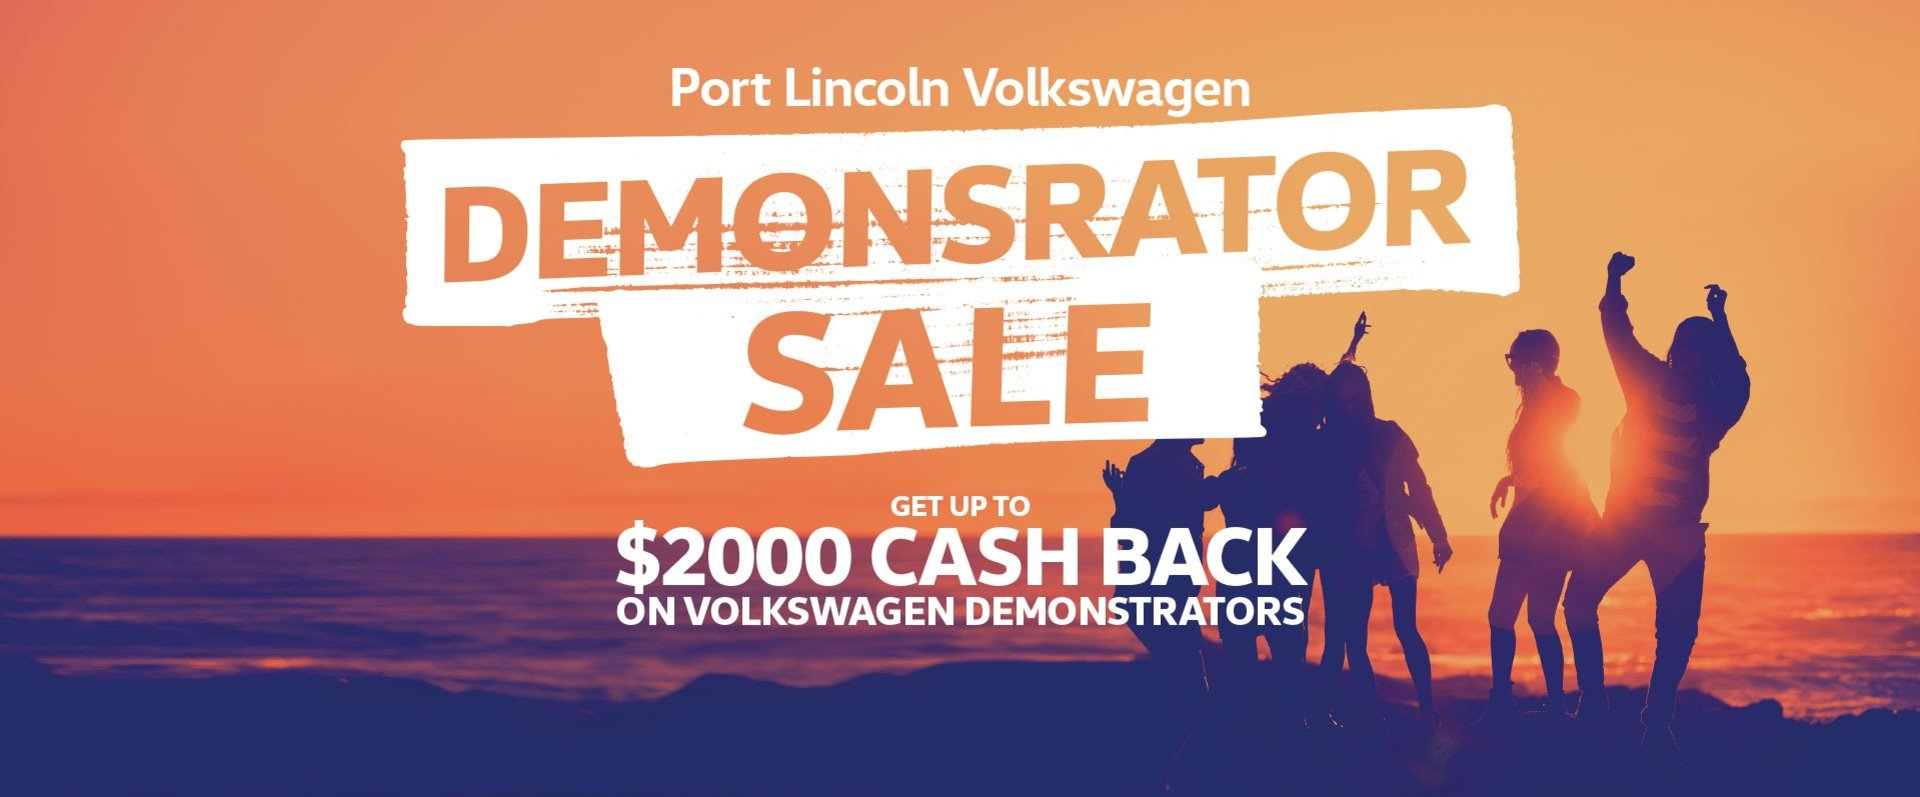 Port Lincoln Volkswagen - Demonstrator Sale